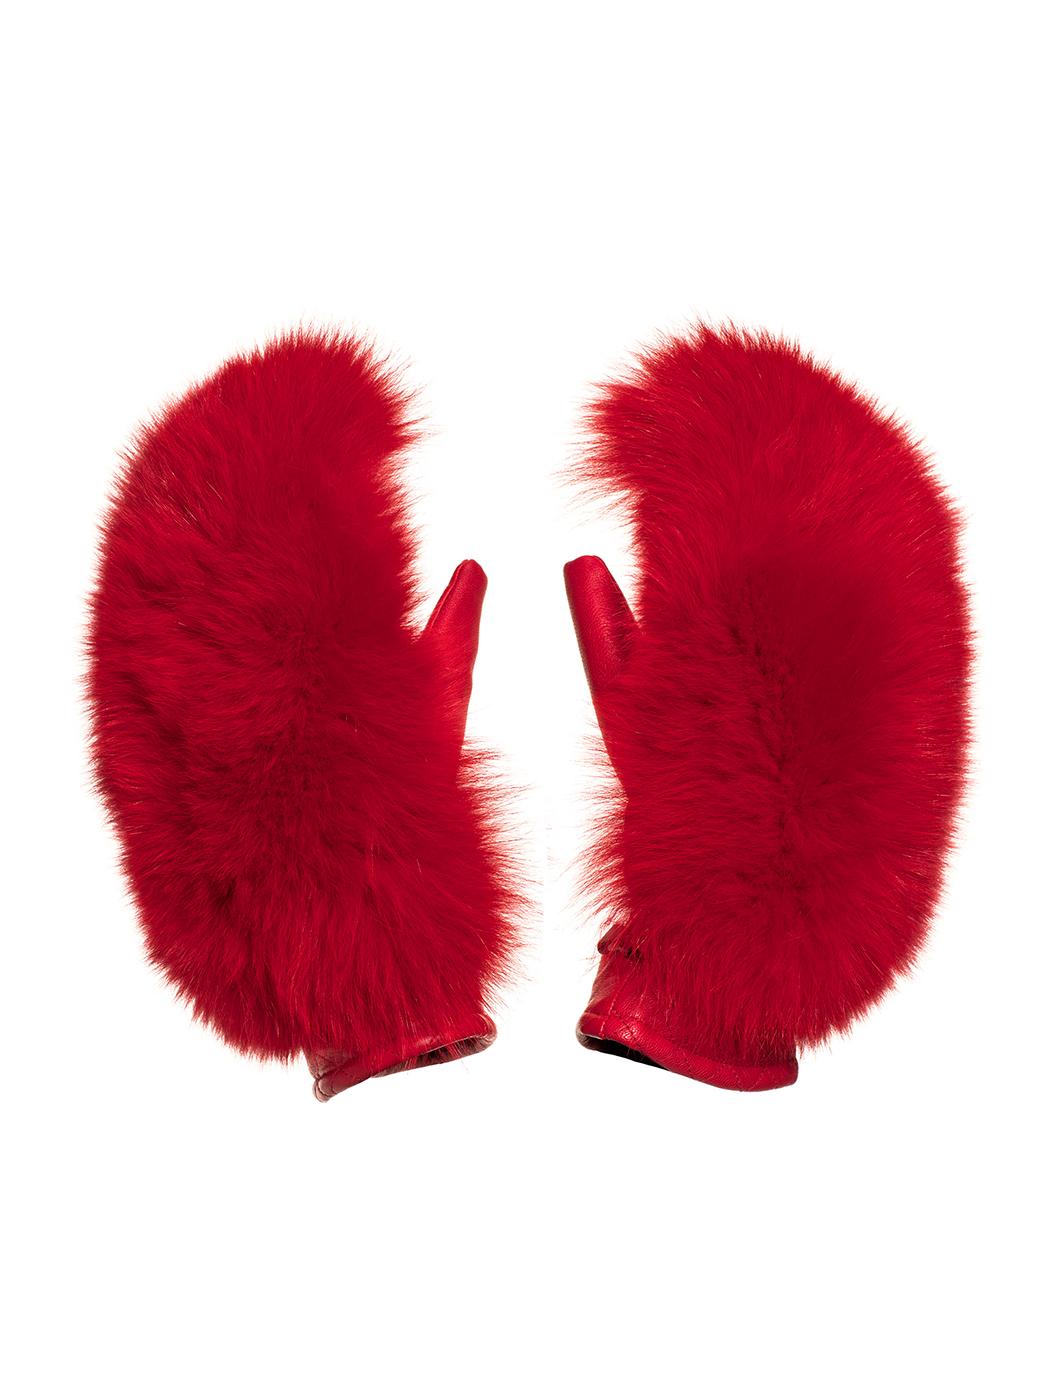 Goldbergh Hando Leather and Fur Mittens